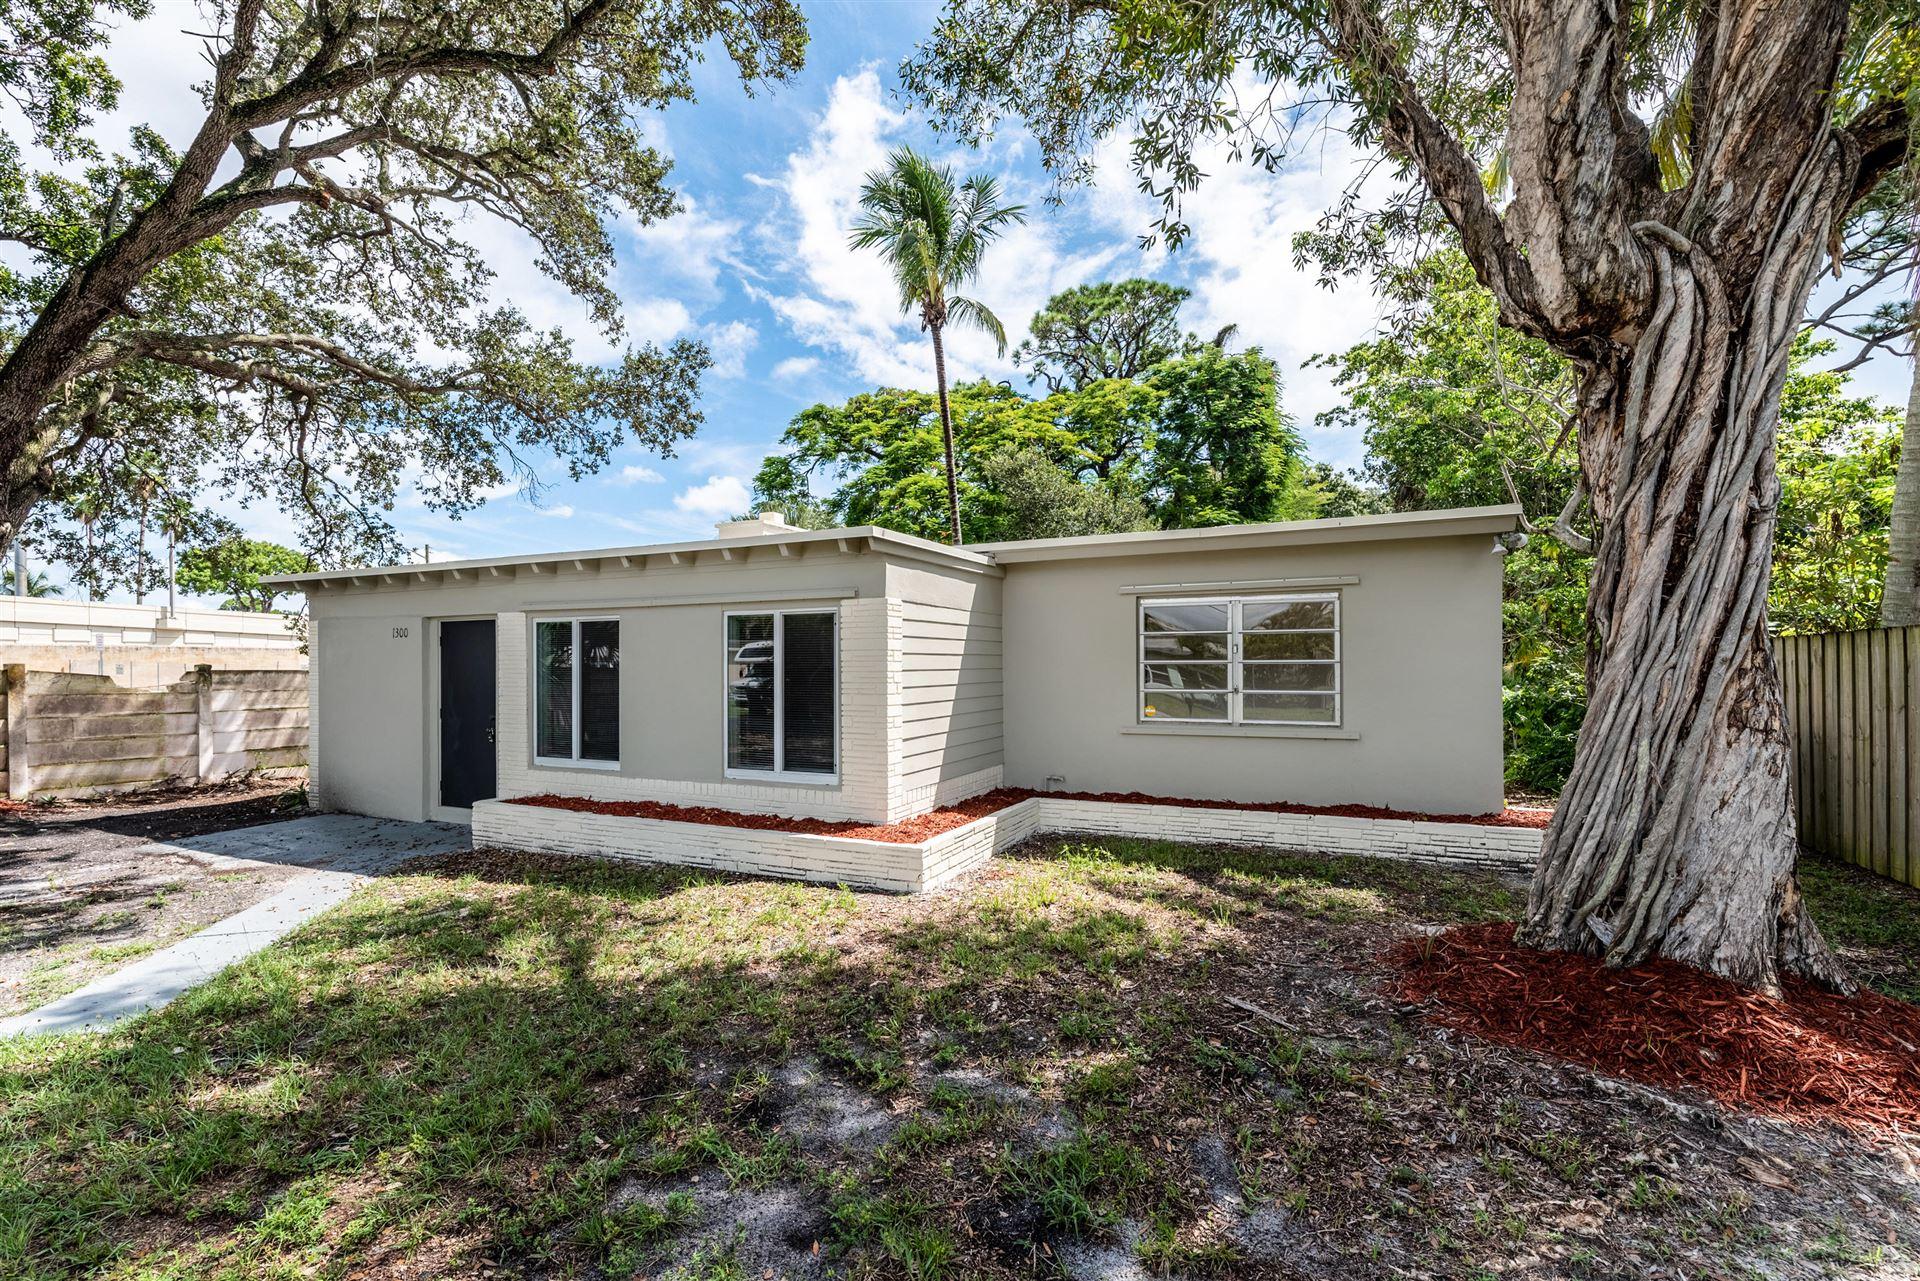 1300 SW 19th Avenue, Fort Lauderdale, FL 33312 - #: RX-10654204